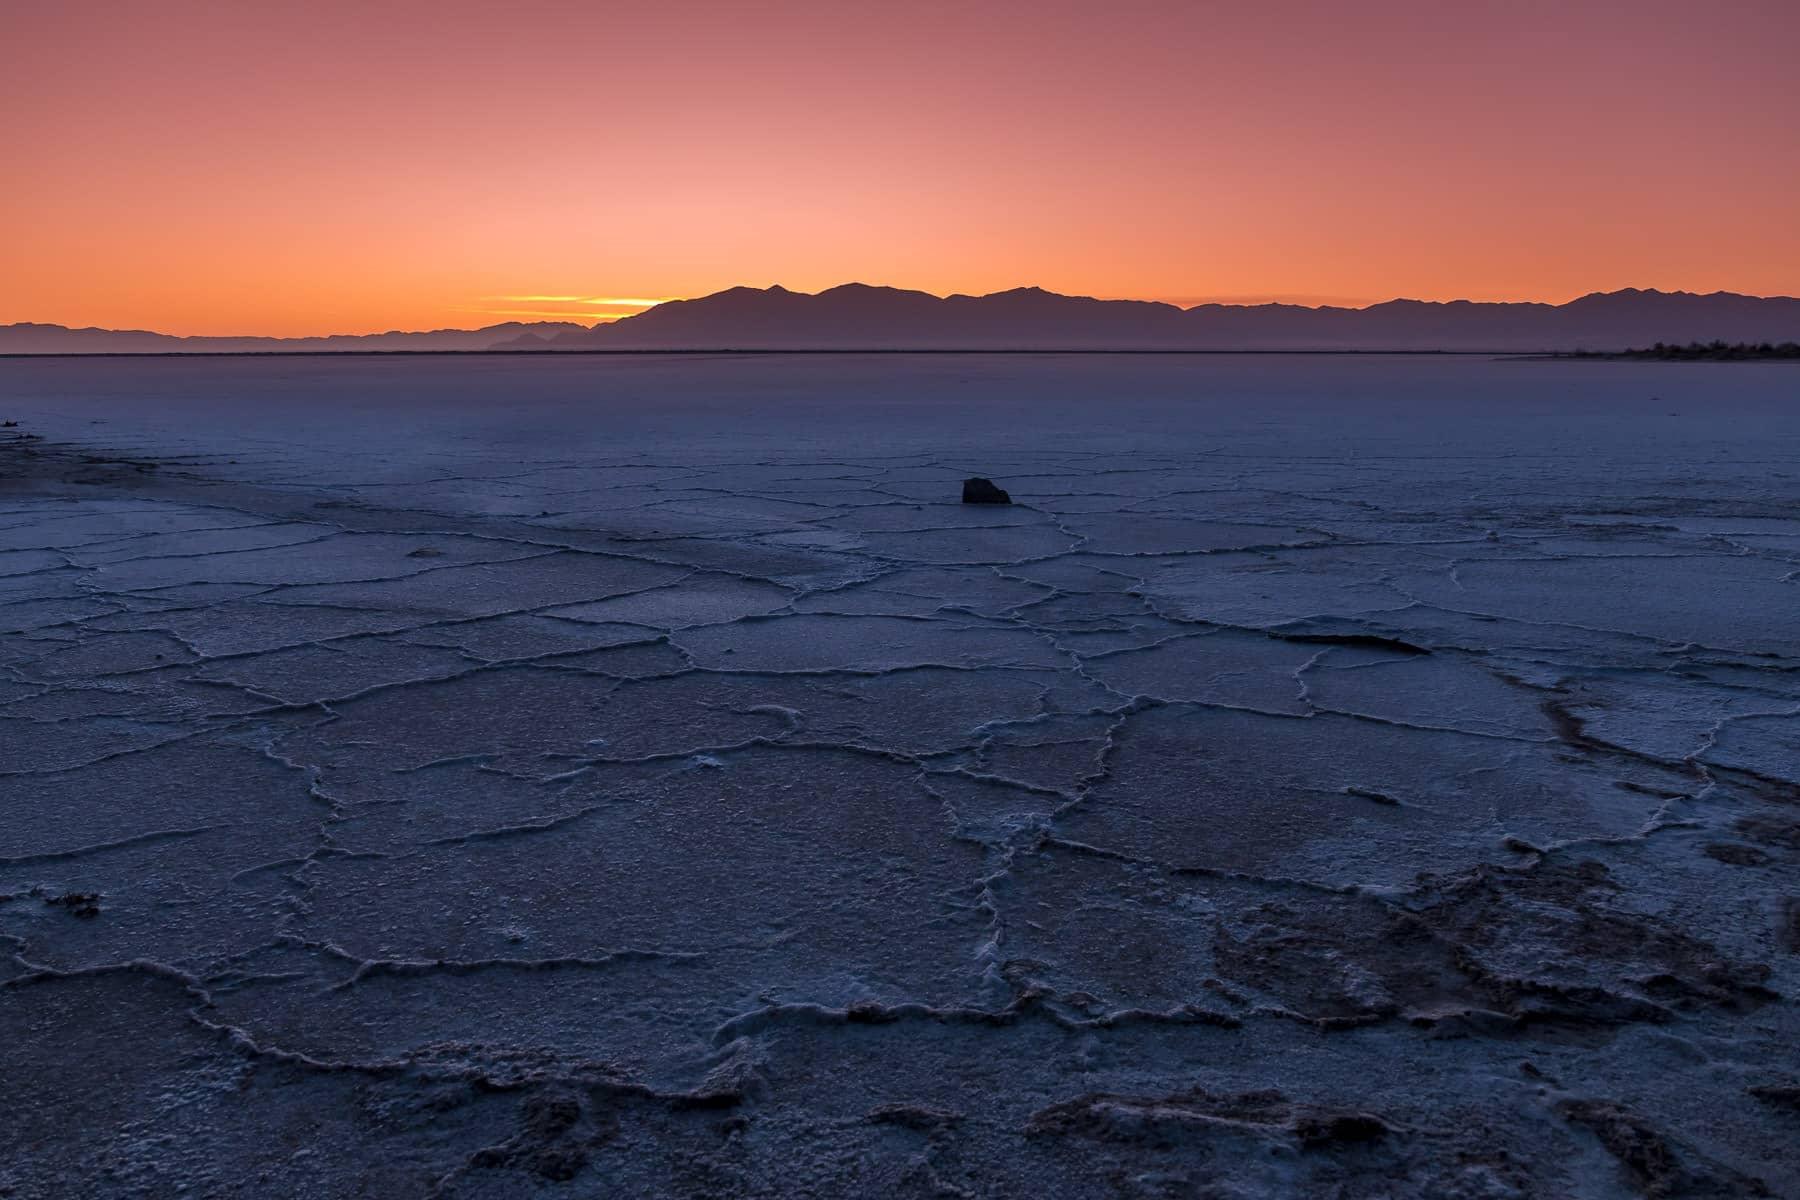 The sun rises on the dried salt flat shore of the Great Salt Lake, Utah.